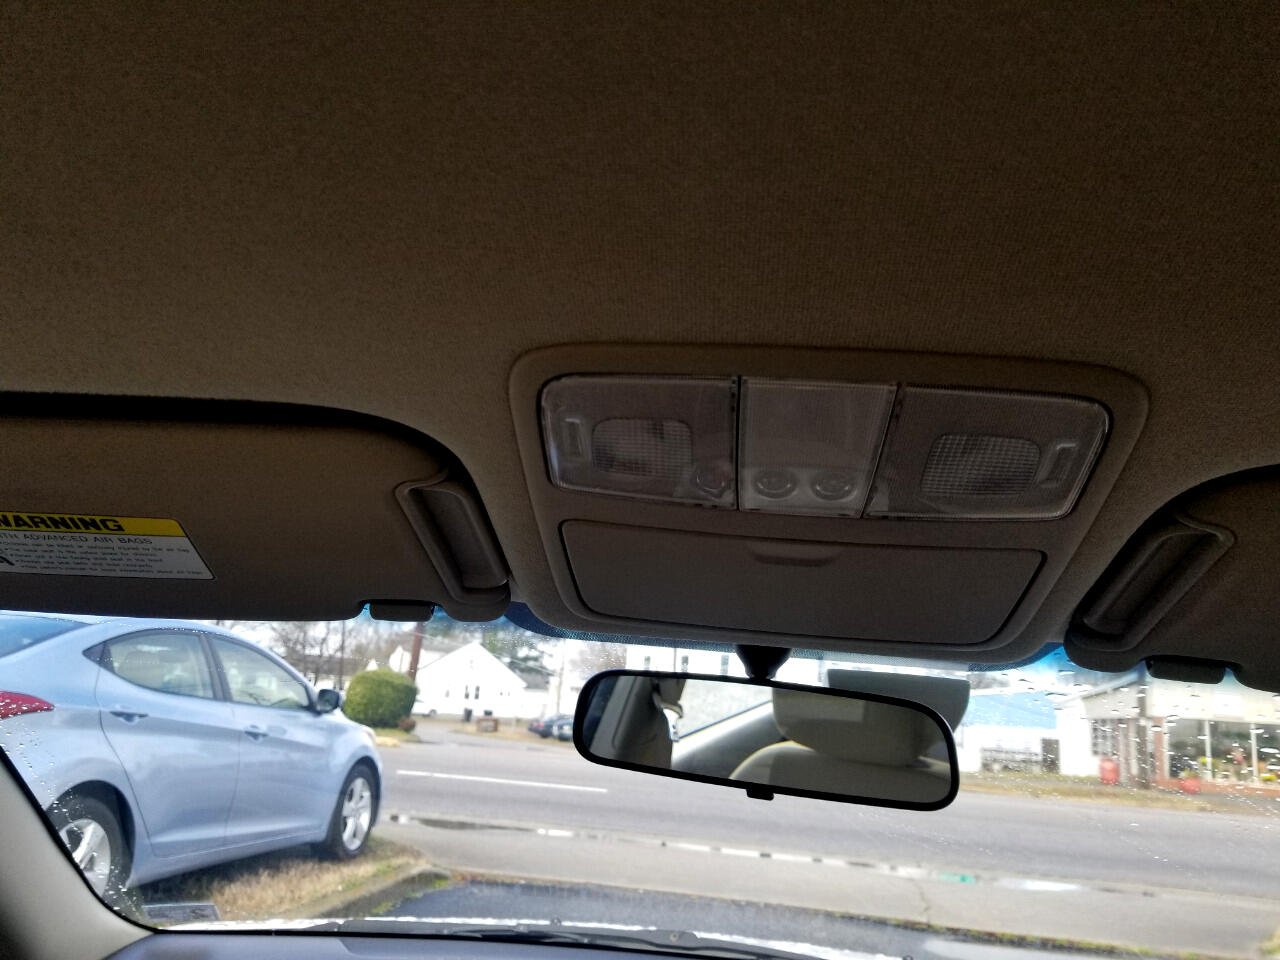 2010 Hyundai Elantra 4dr Sdn Auto GLS PZEV